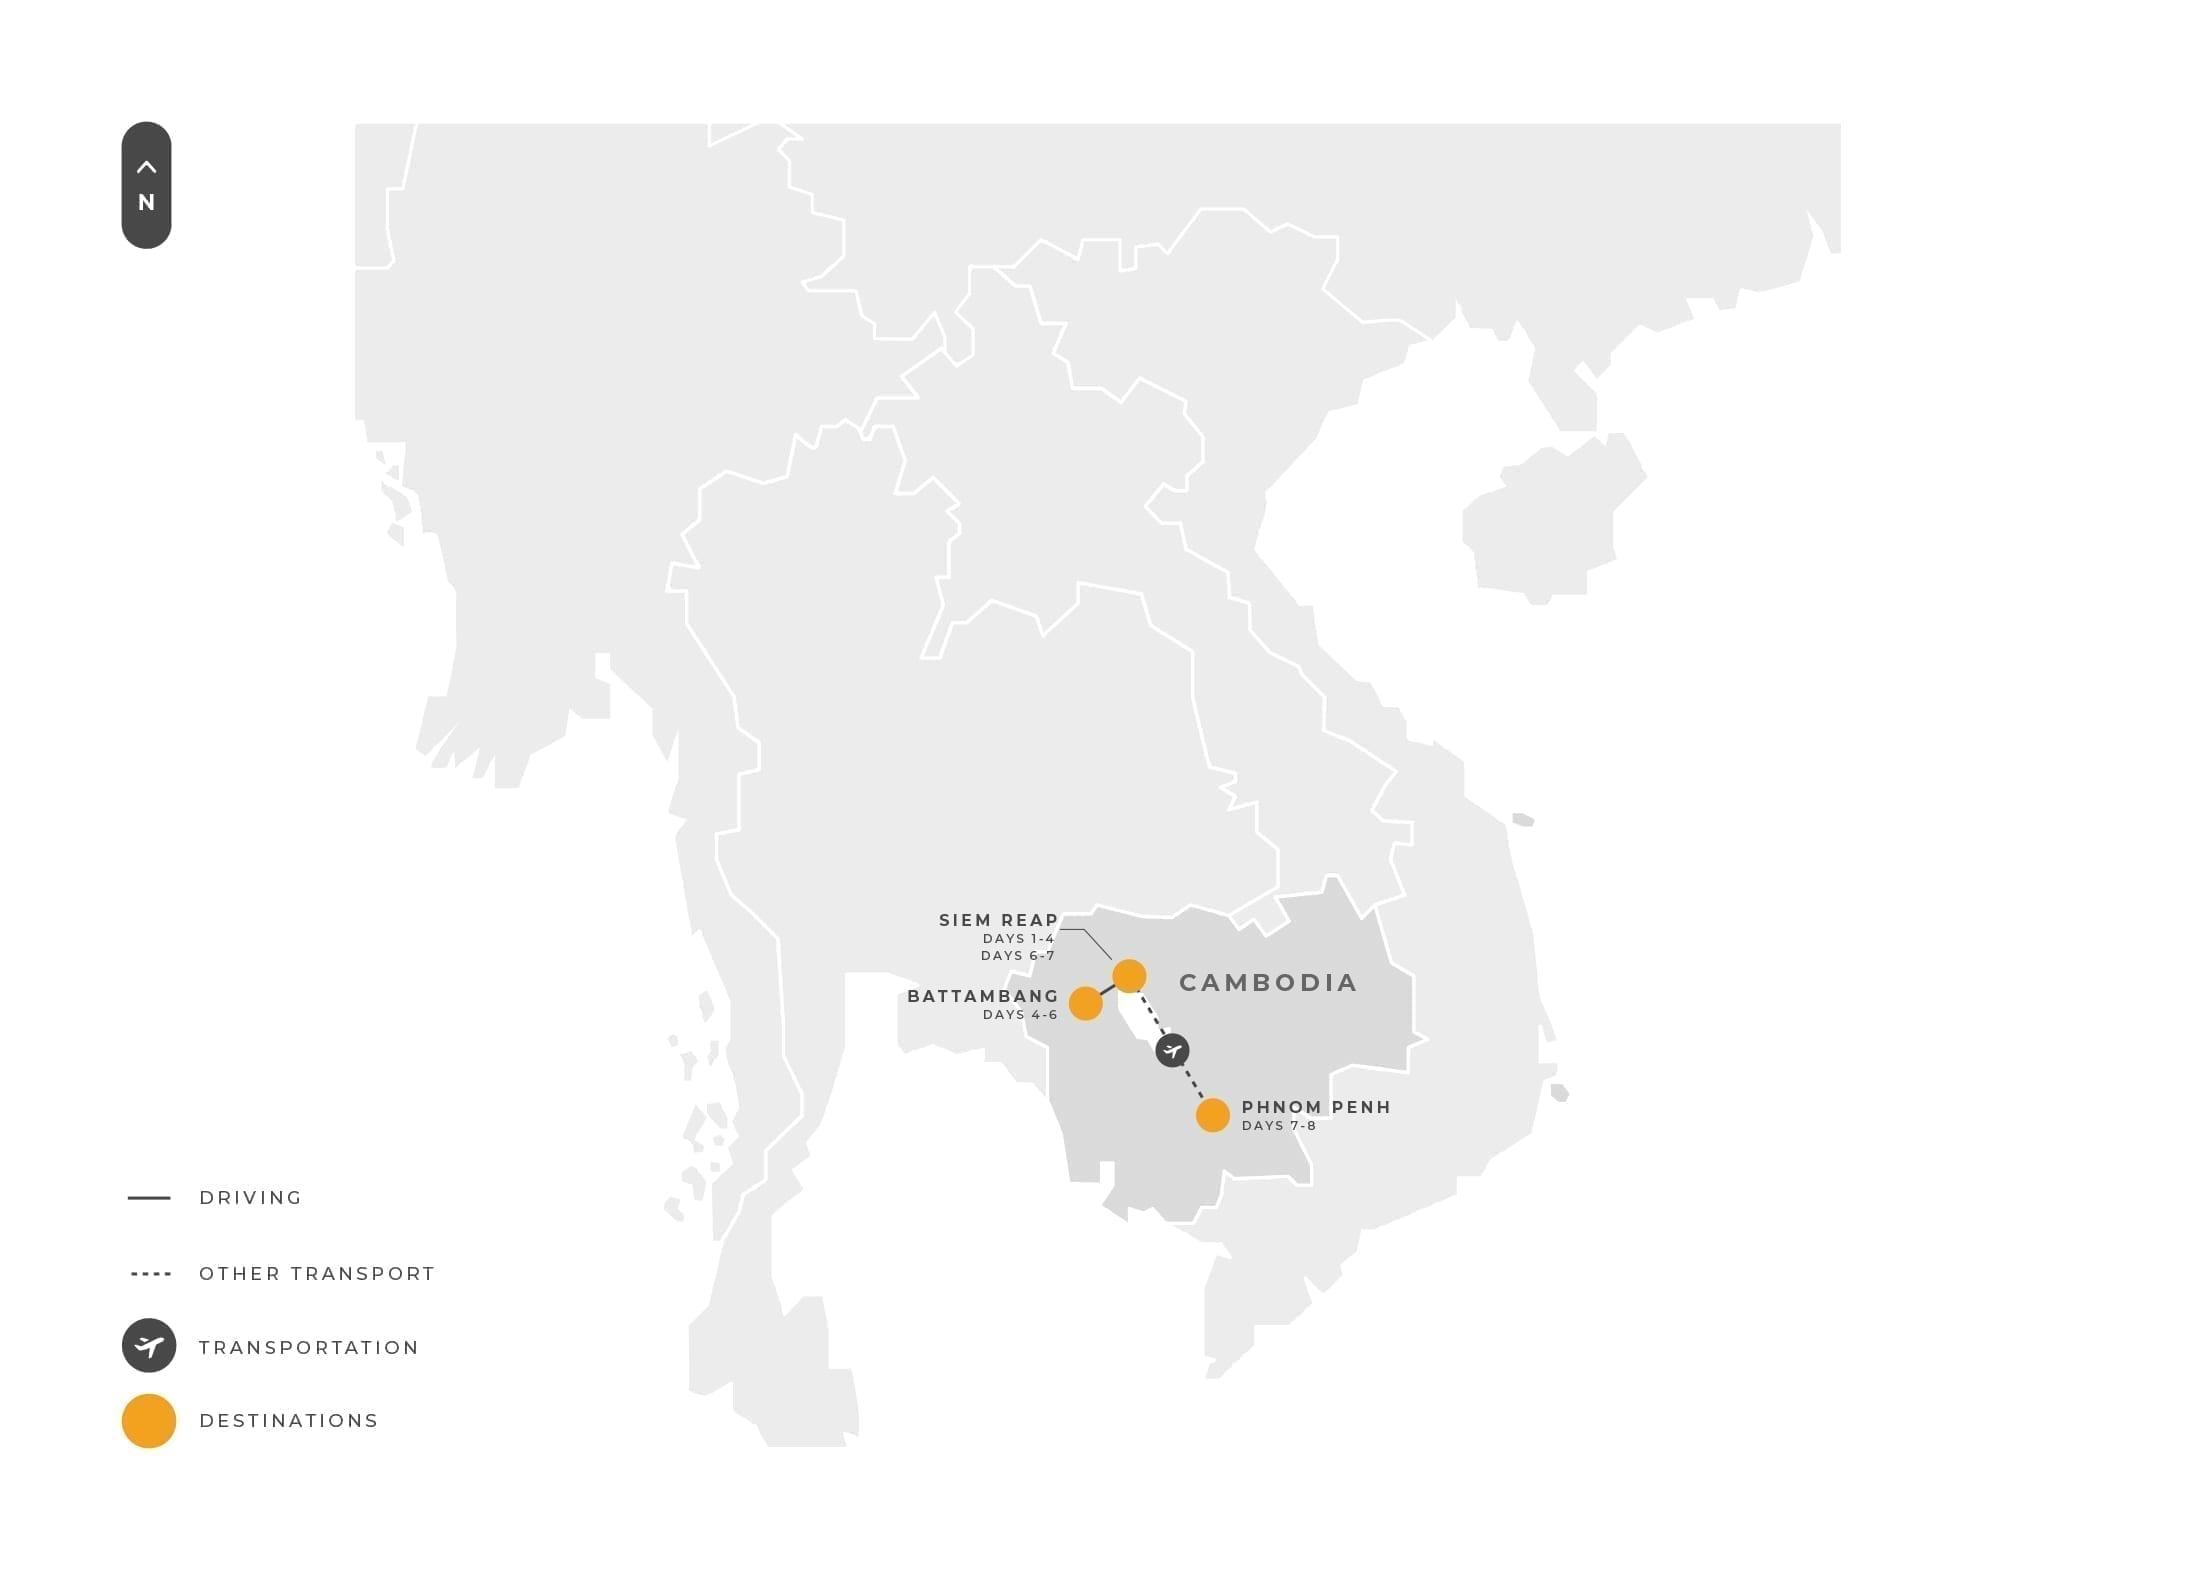 Cambodia 8 Days Siemreap Battambang And Phnompenh Tour